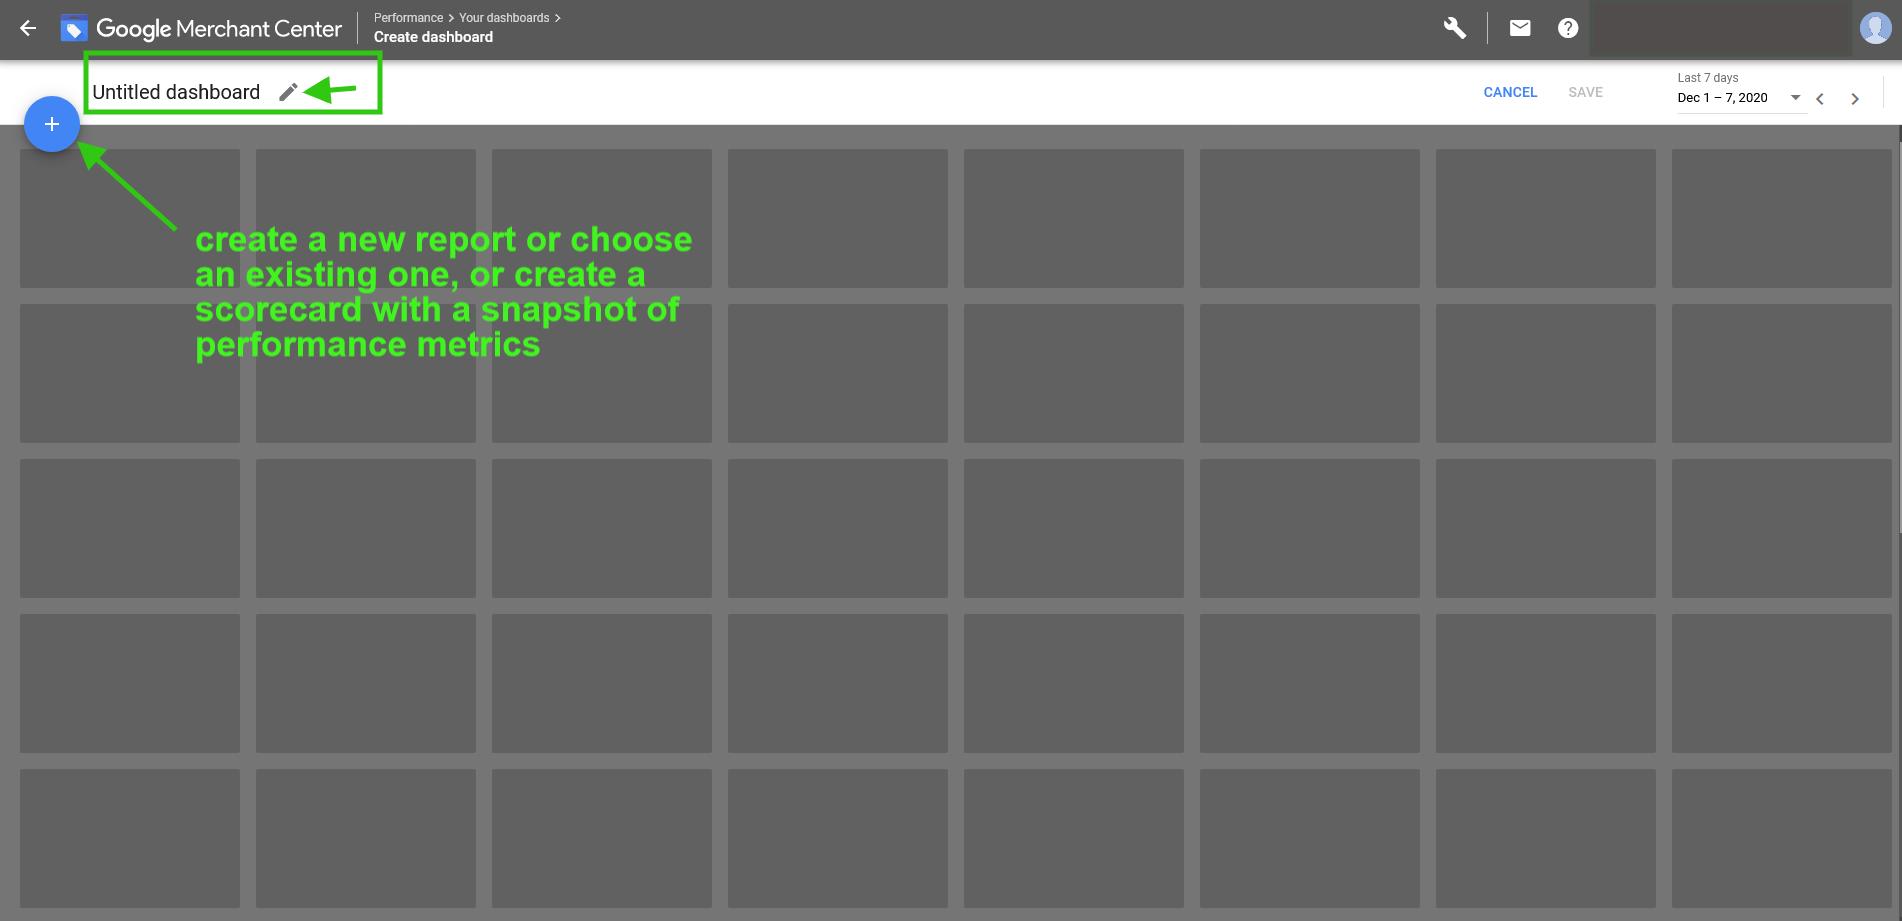 Google Merchant Center custom dashboard adding new report